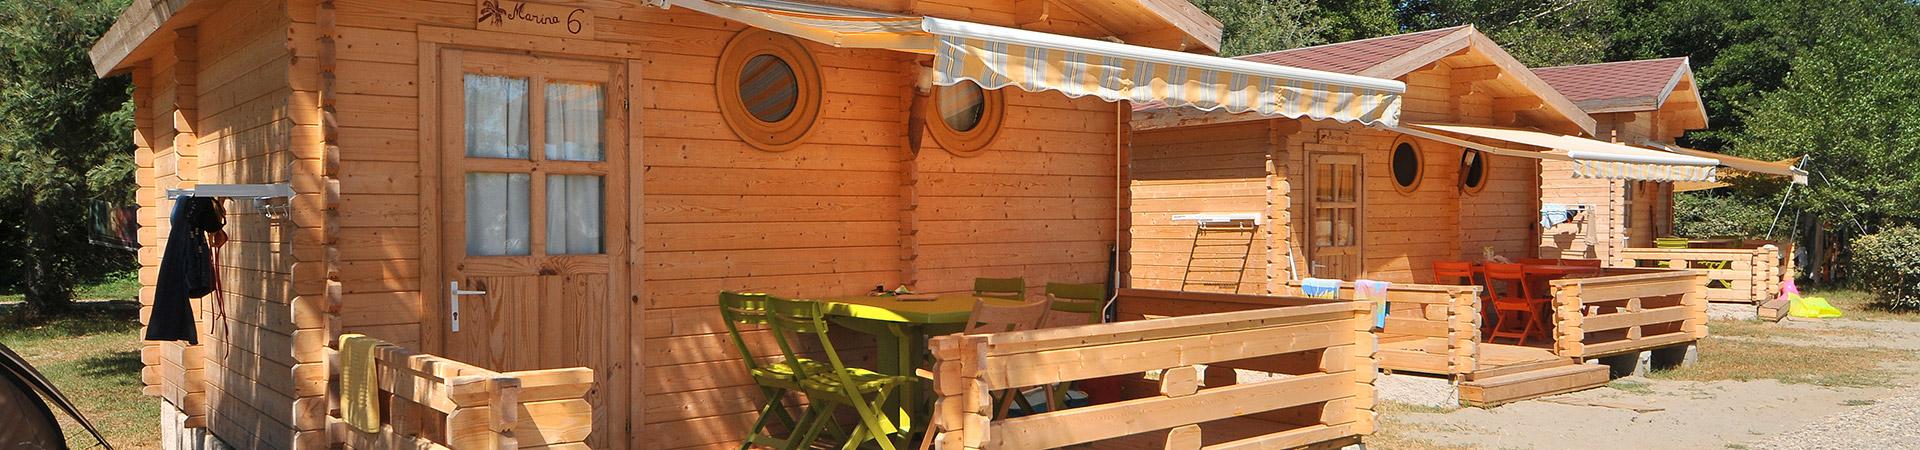 location-marina-camping-merendella